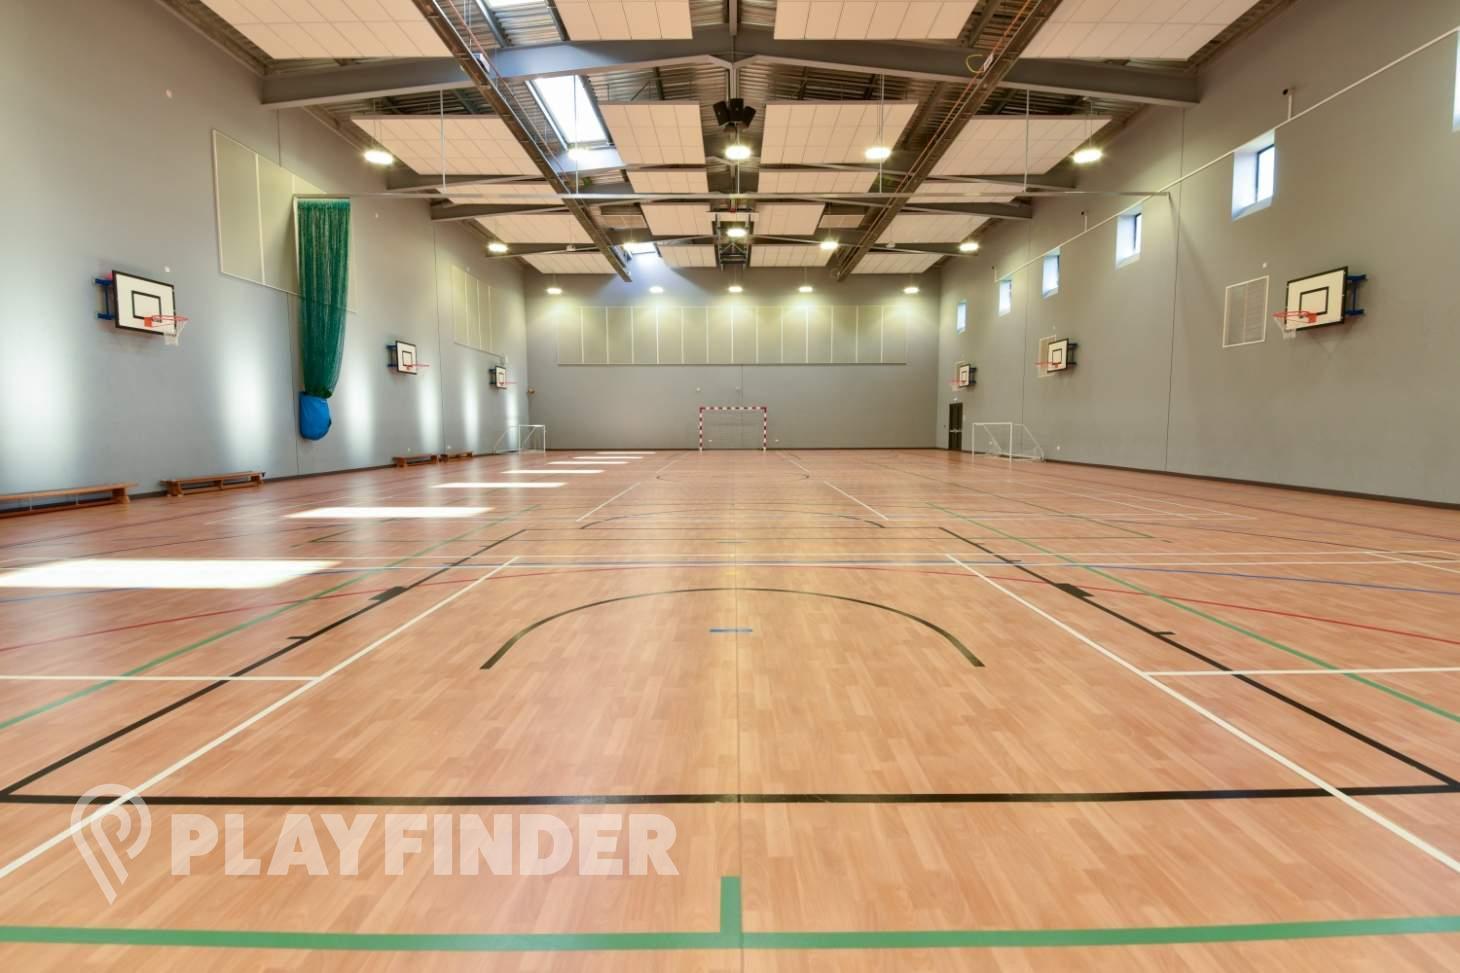 Carshalton High School For Girls Indoor basketball court